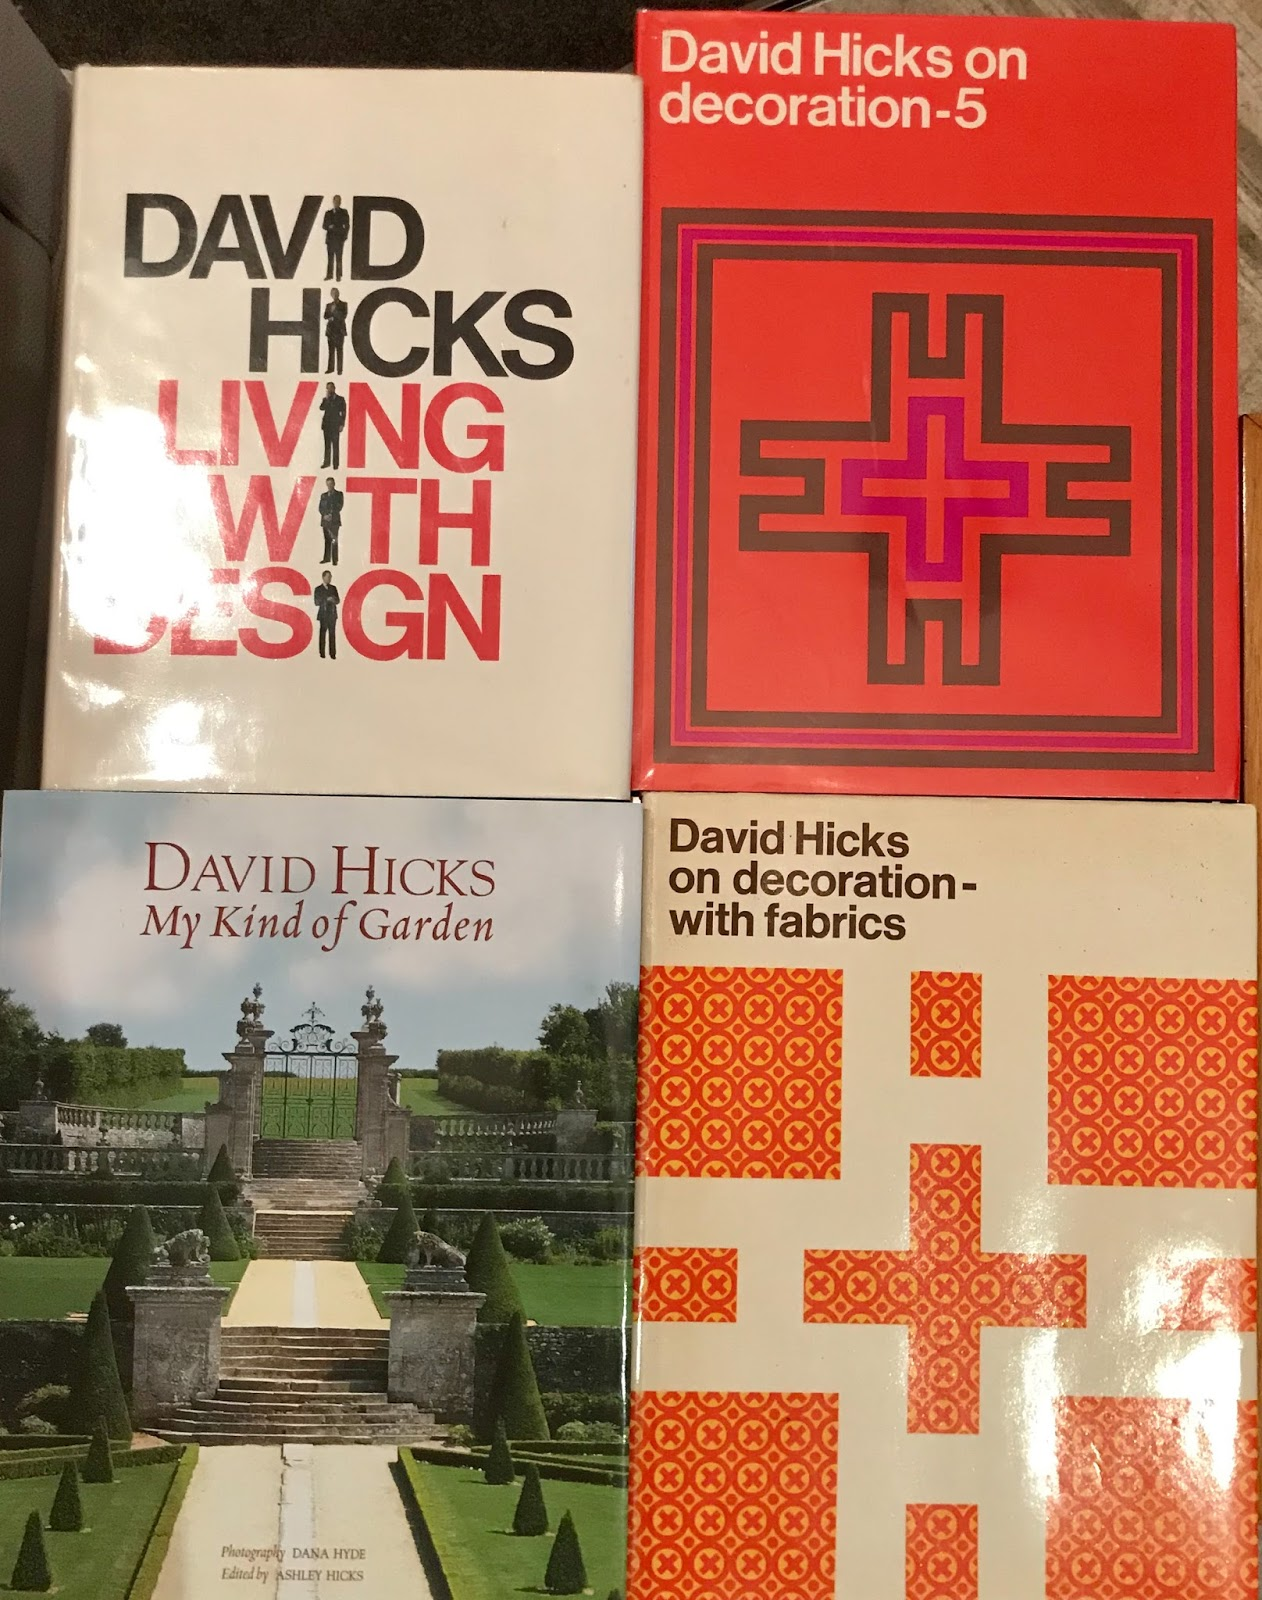 950604f0e72 Adelaide Villa  An enduring influence on Design - David Hicks